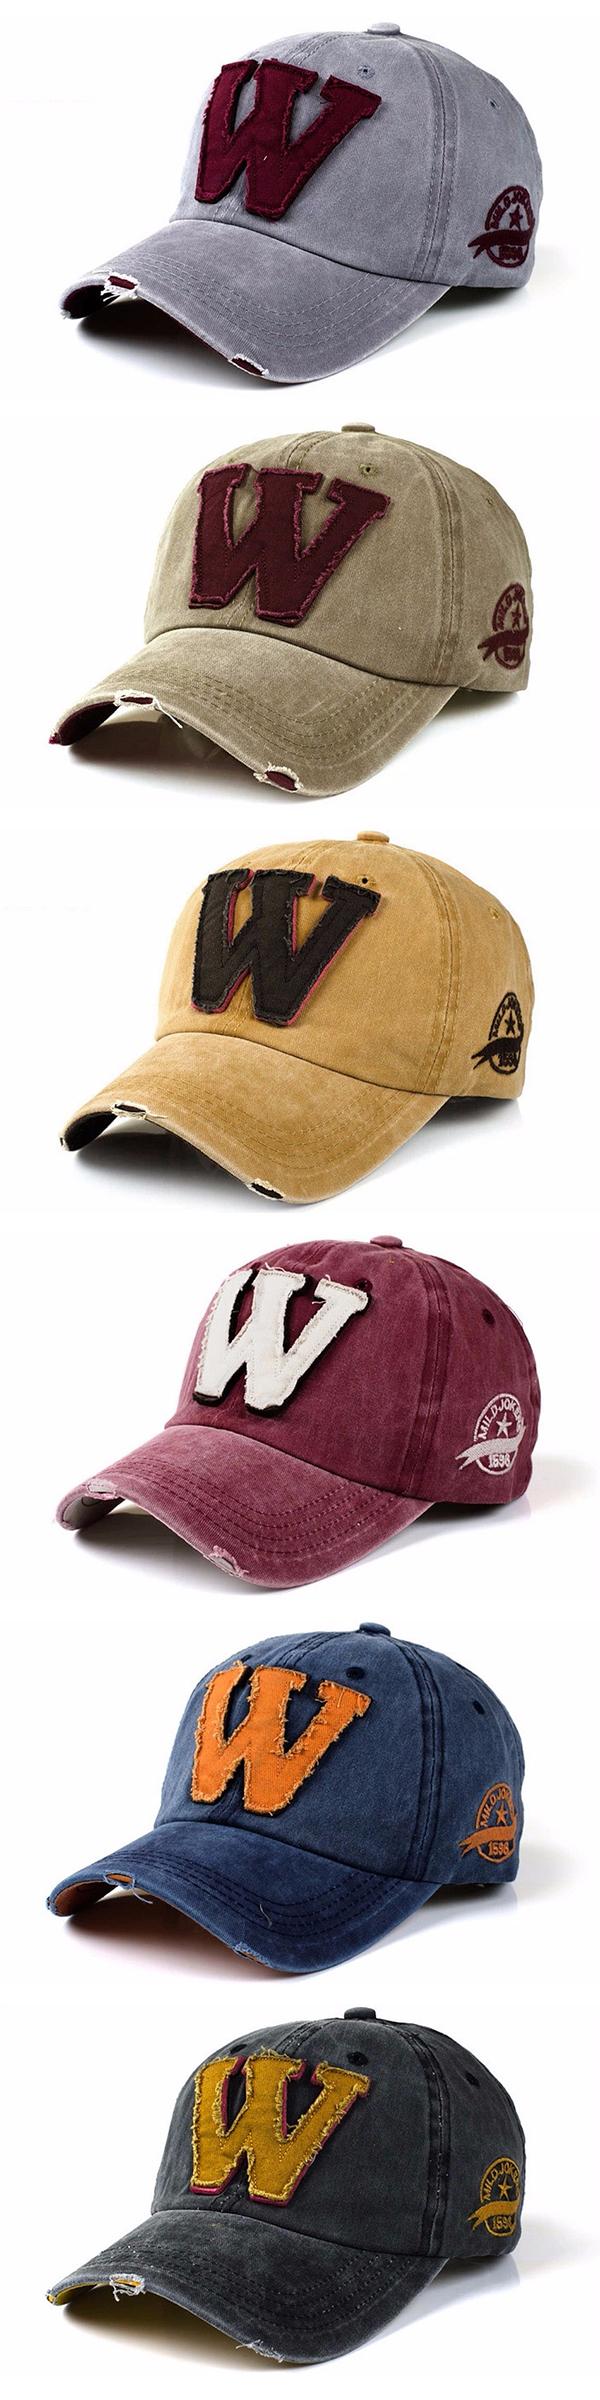 48bf4663c5d Men Women Baseball Cap   Trucker Cap   Sport Snapback Washed Hip-hop  Adjustable Hat